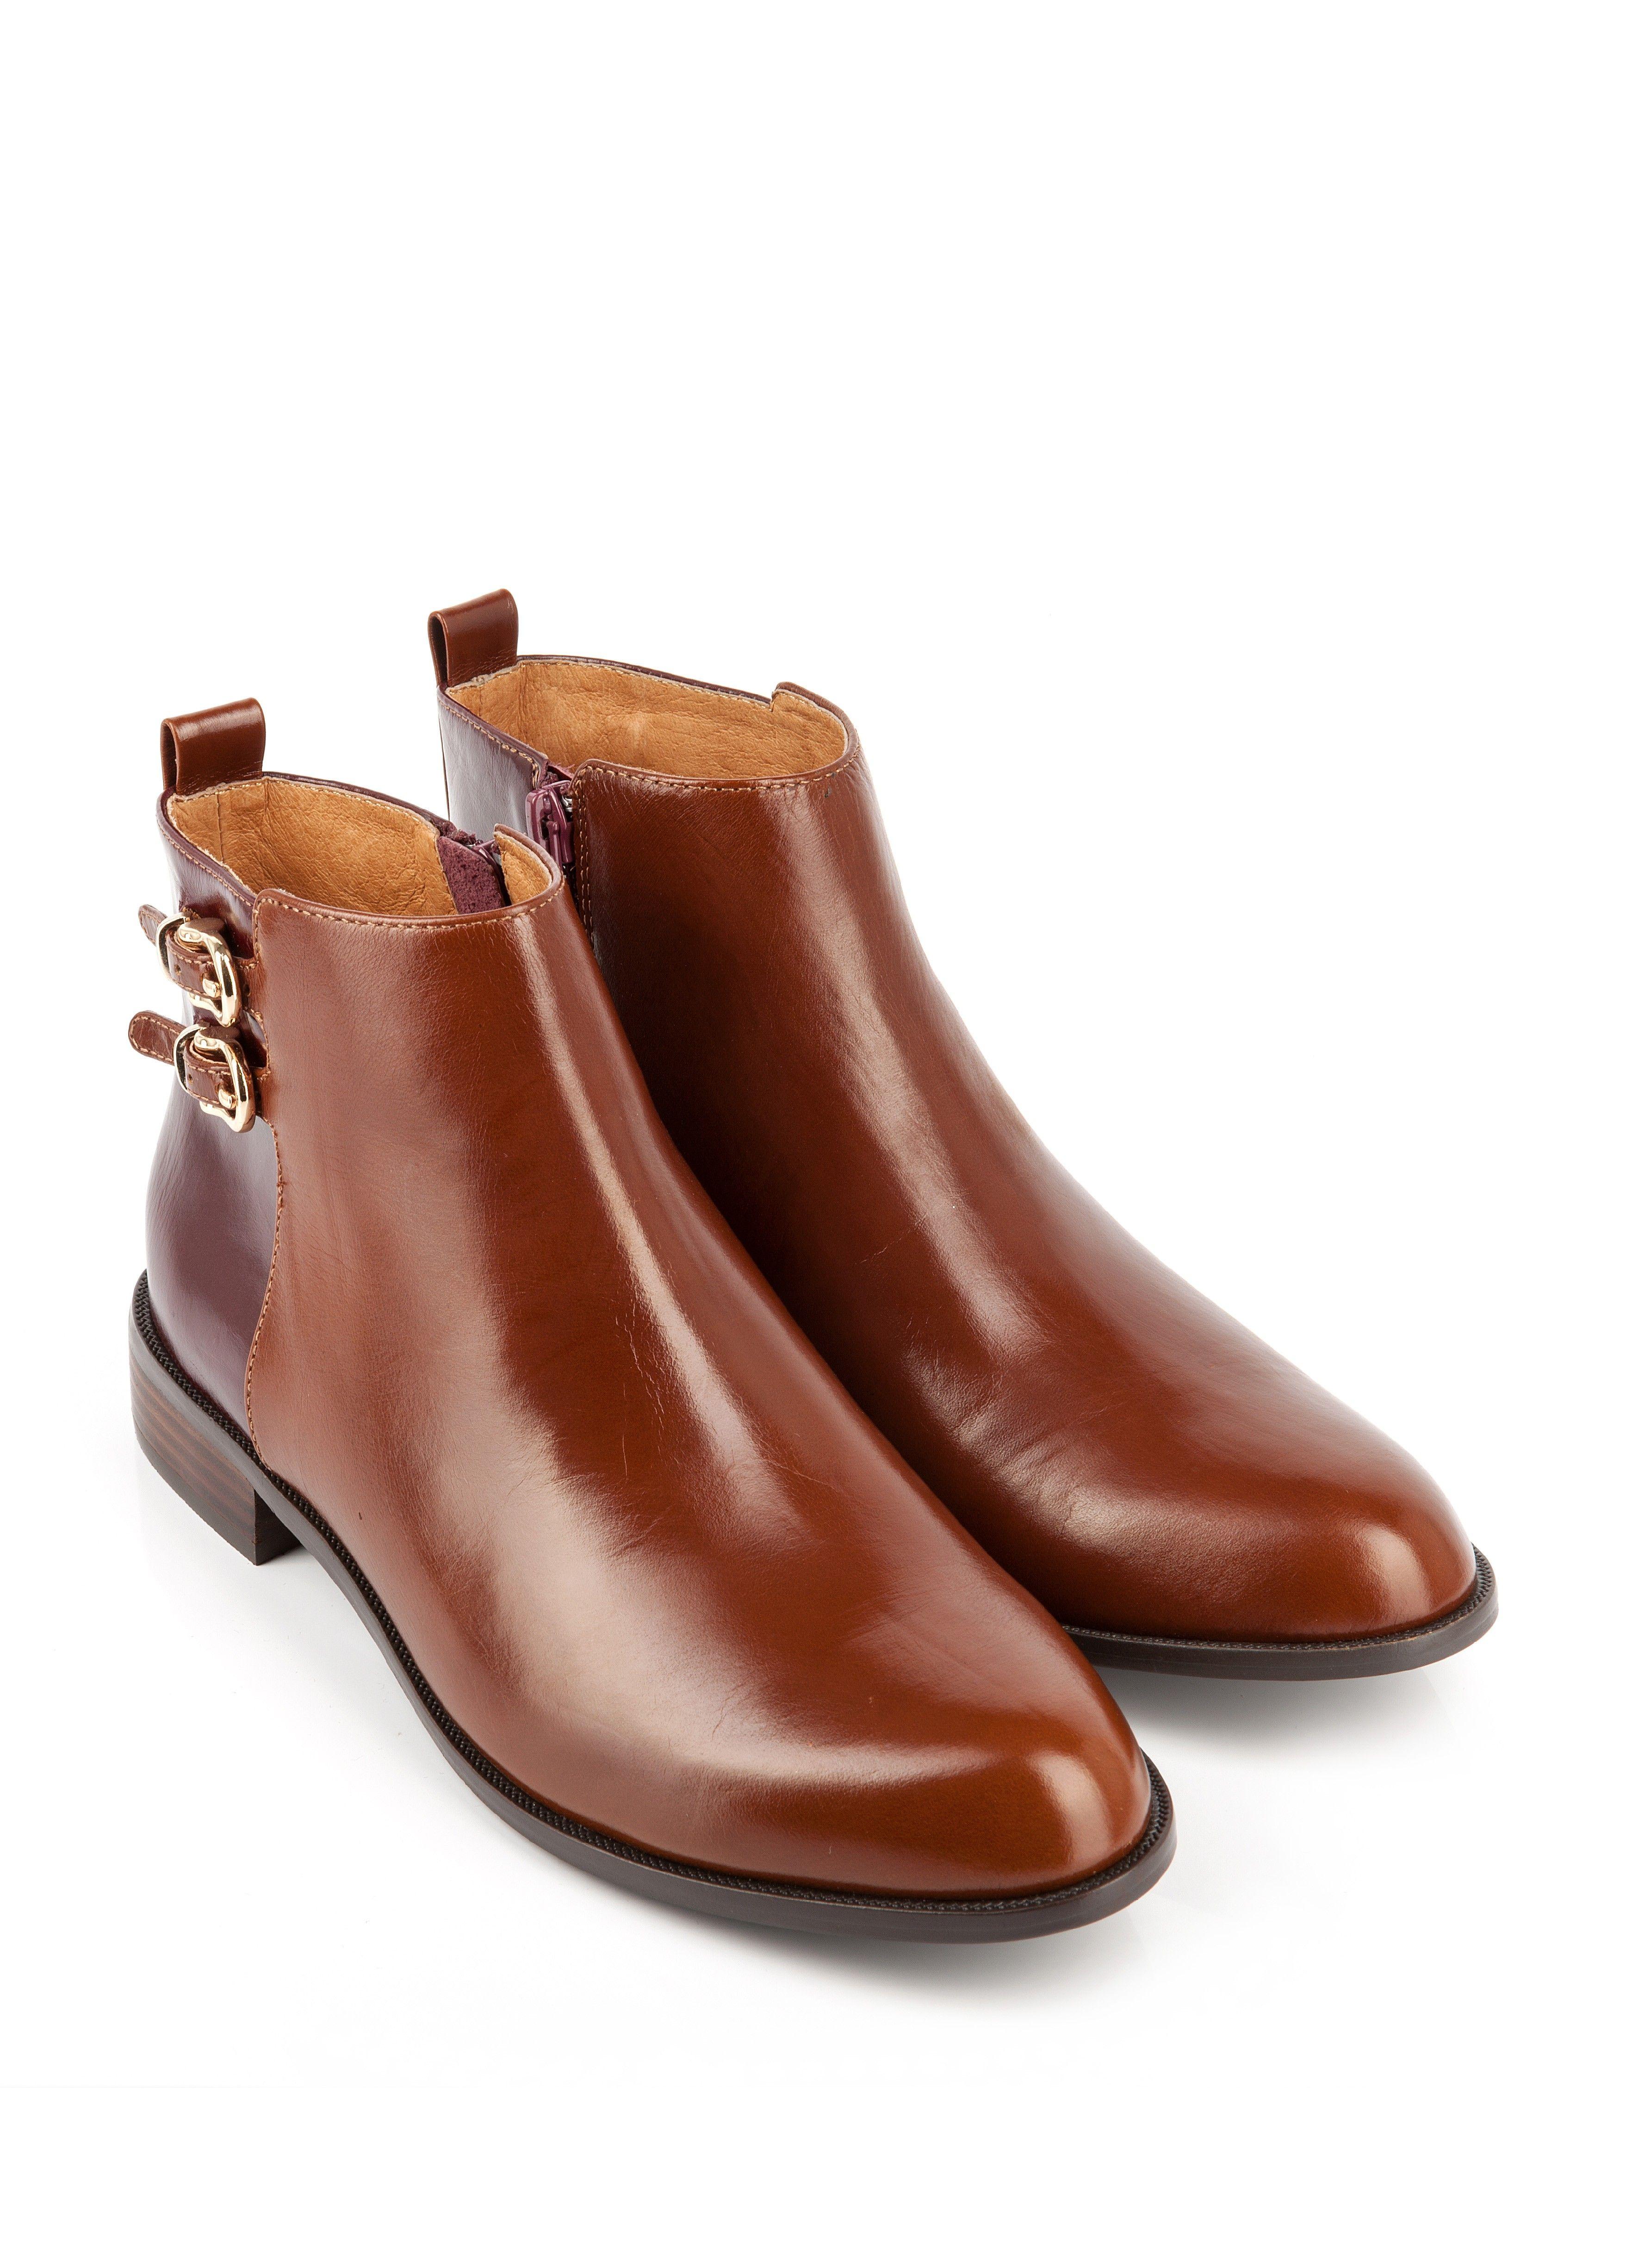 b203dde18083f Bottine TAVIA Camel - FEMME   chaussures   Pinterest